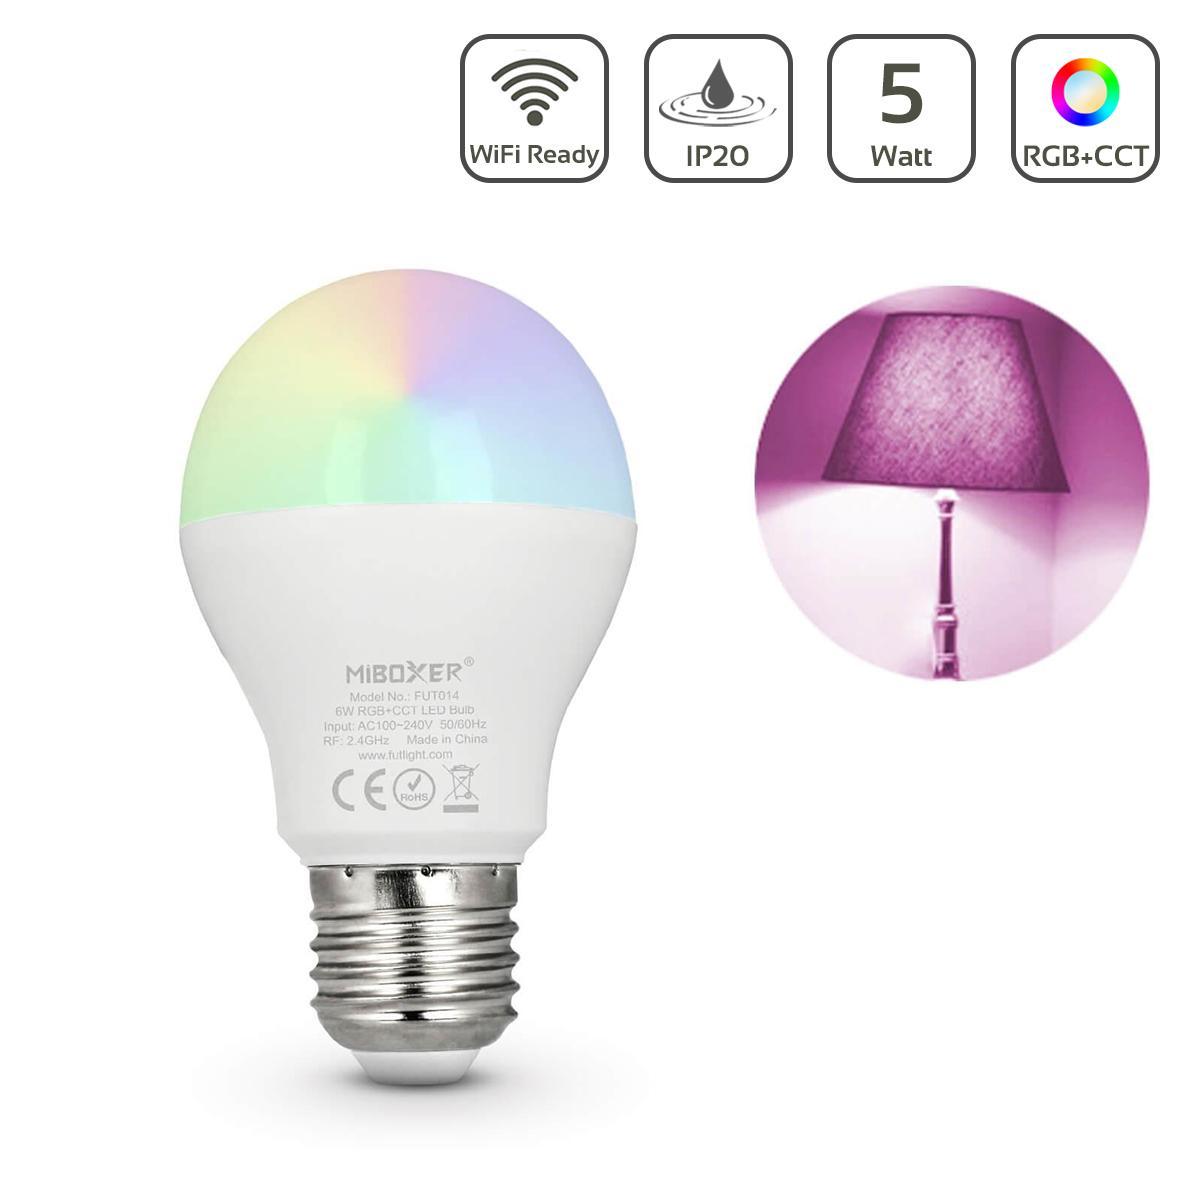 MiBoxer RGB+CCT Lampe  6W E27   WiFi ready   FUT014